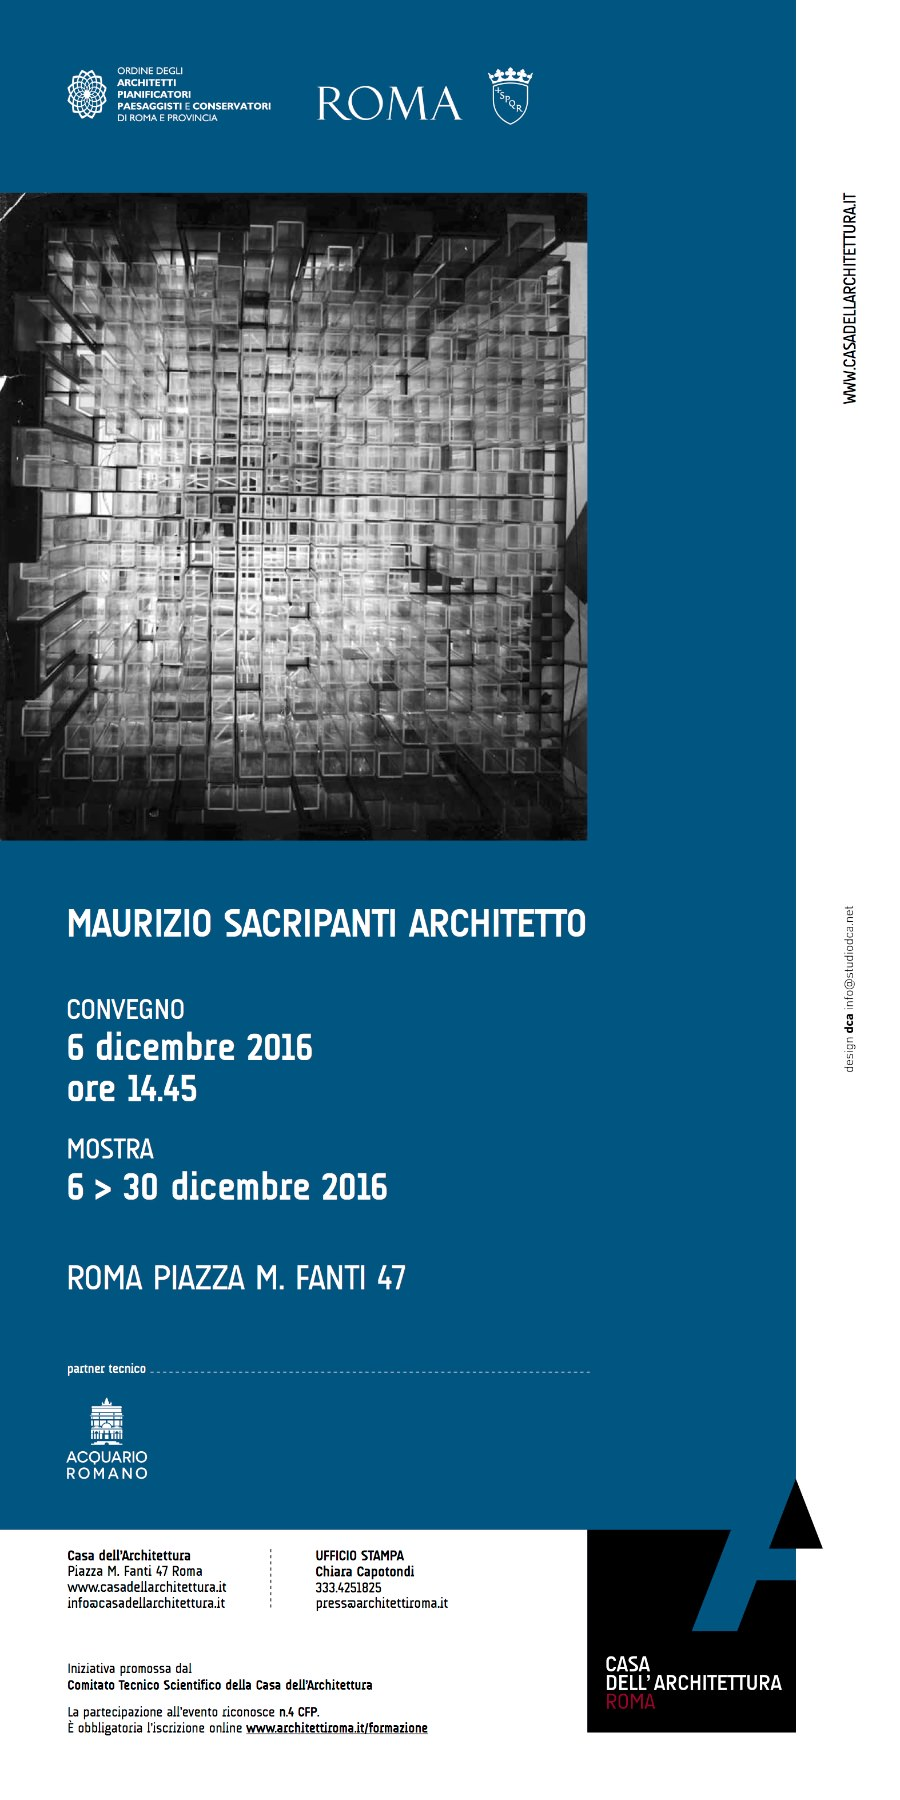 locandina-mostra-maurizio-sacripanti_architetto-cda-roma